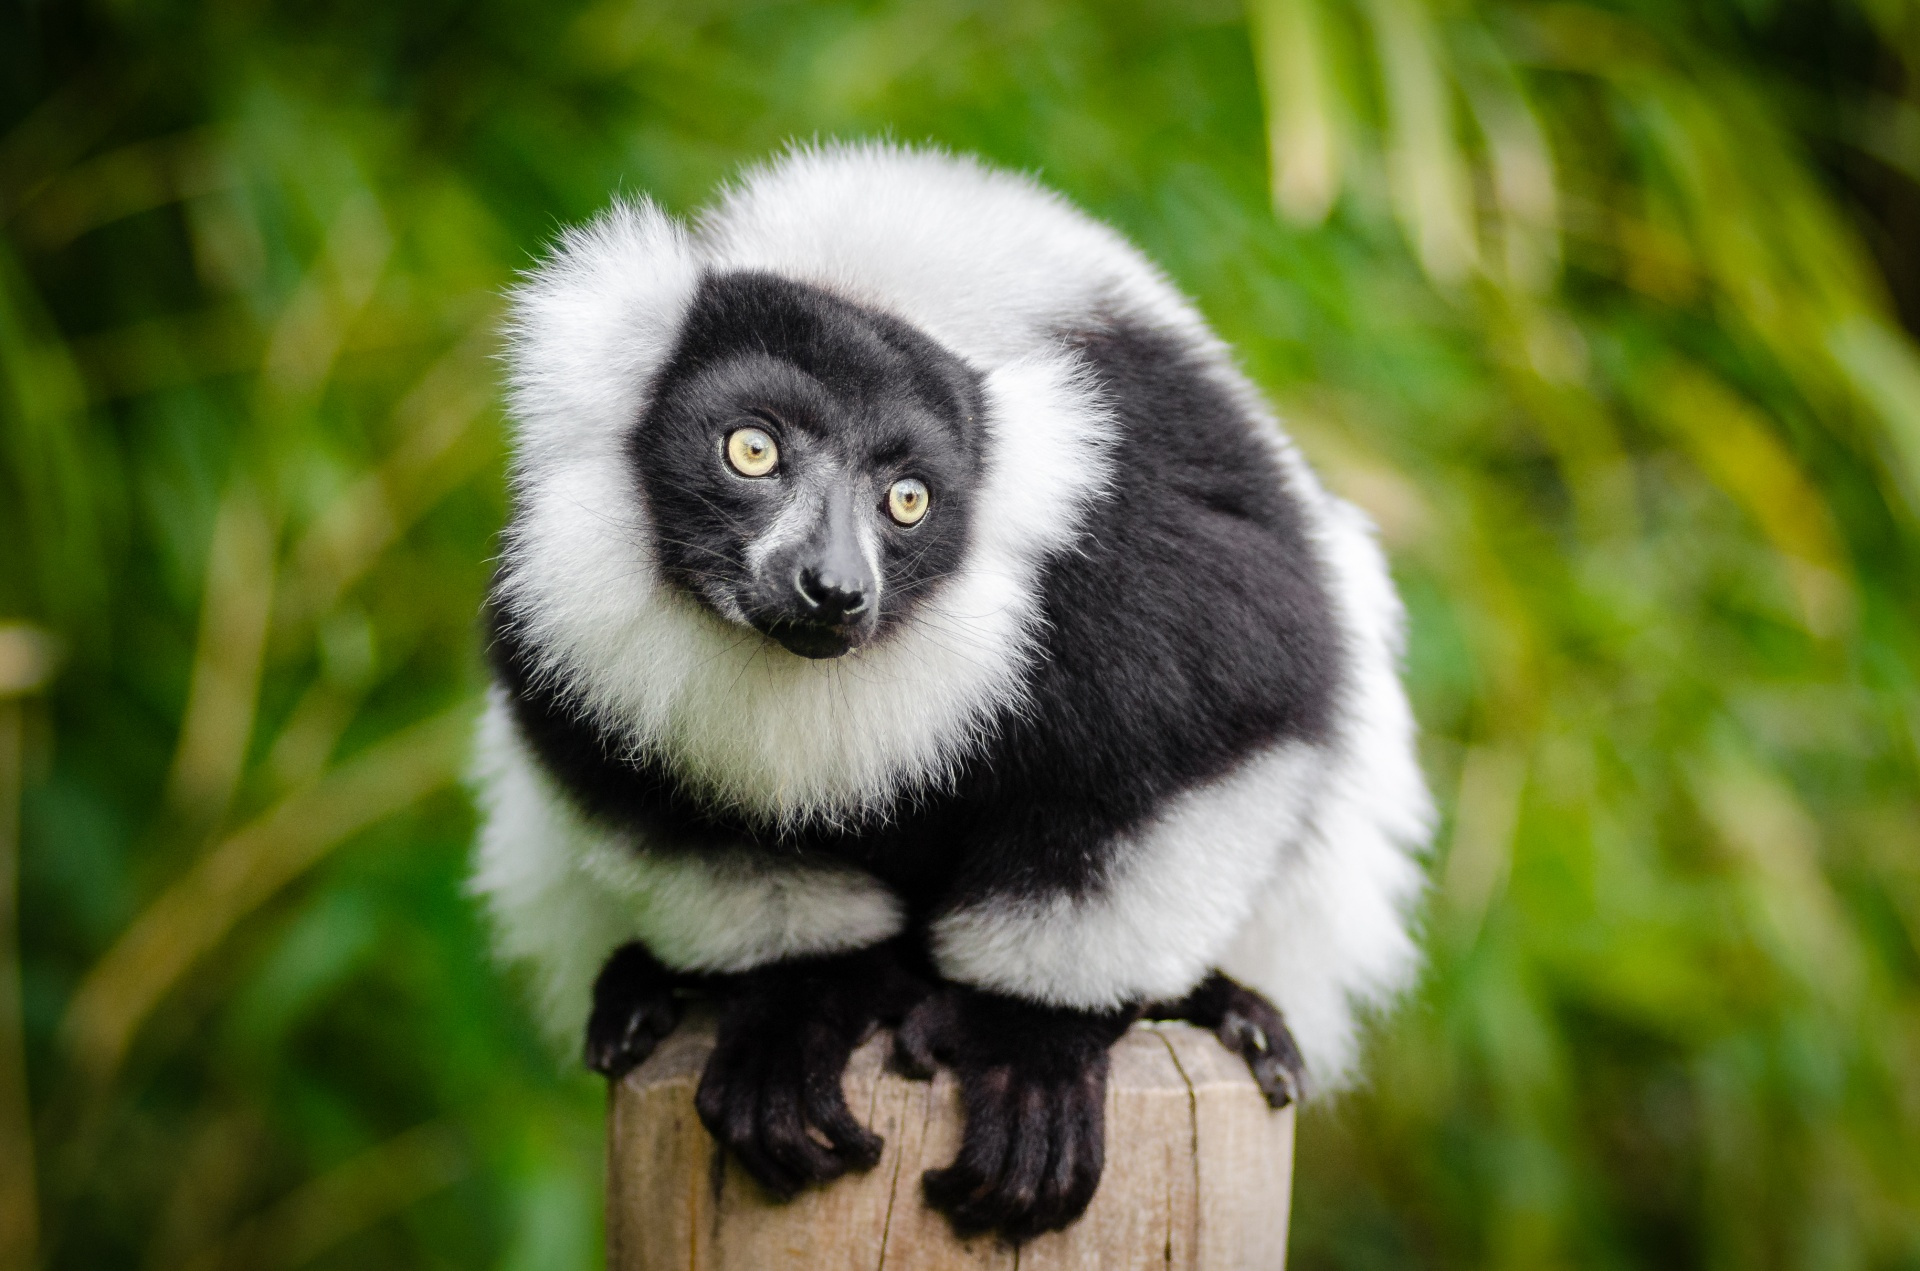 Black And White Animal Wallpaper Ring Tailed Lemur Lemur Free Stock Photo Public Domain